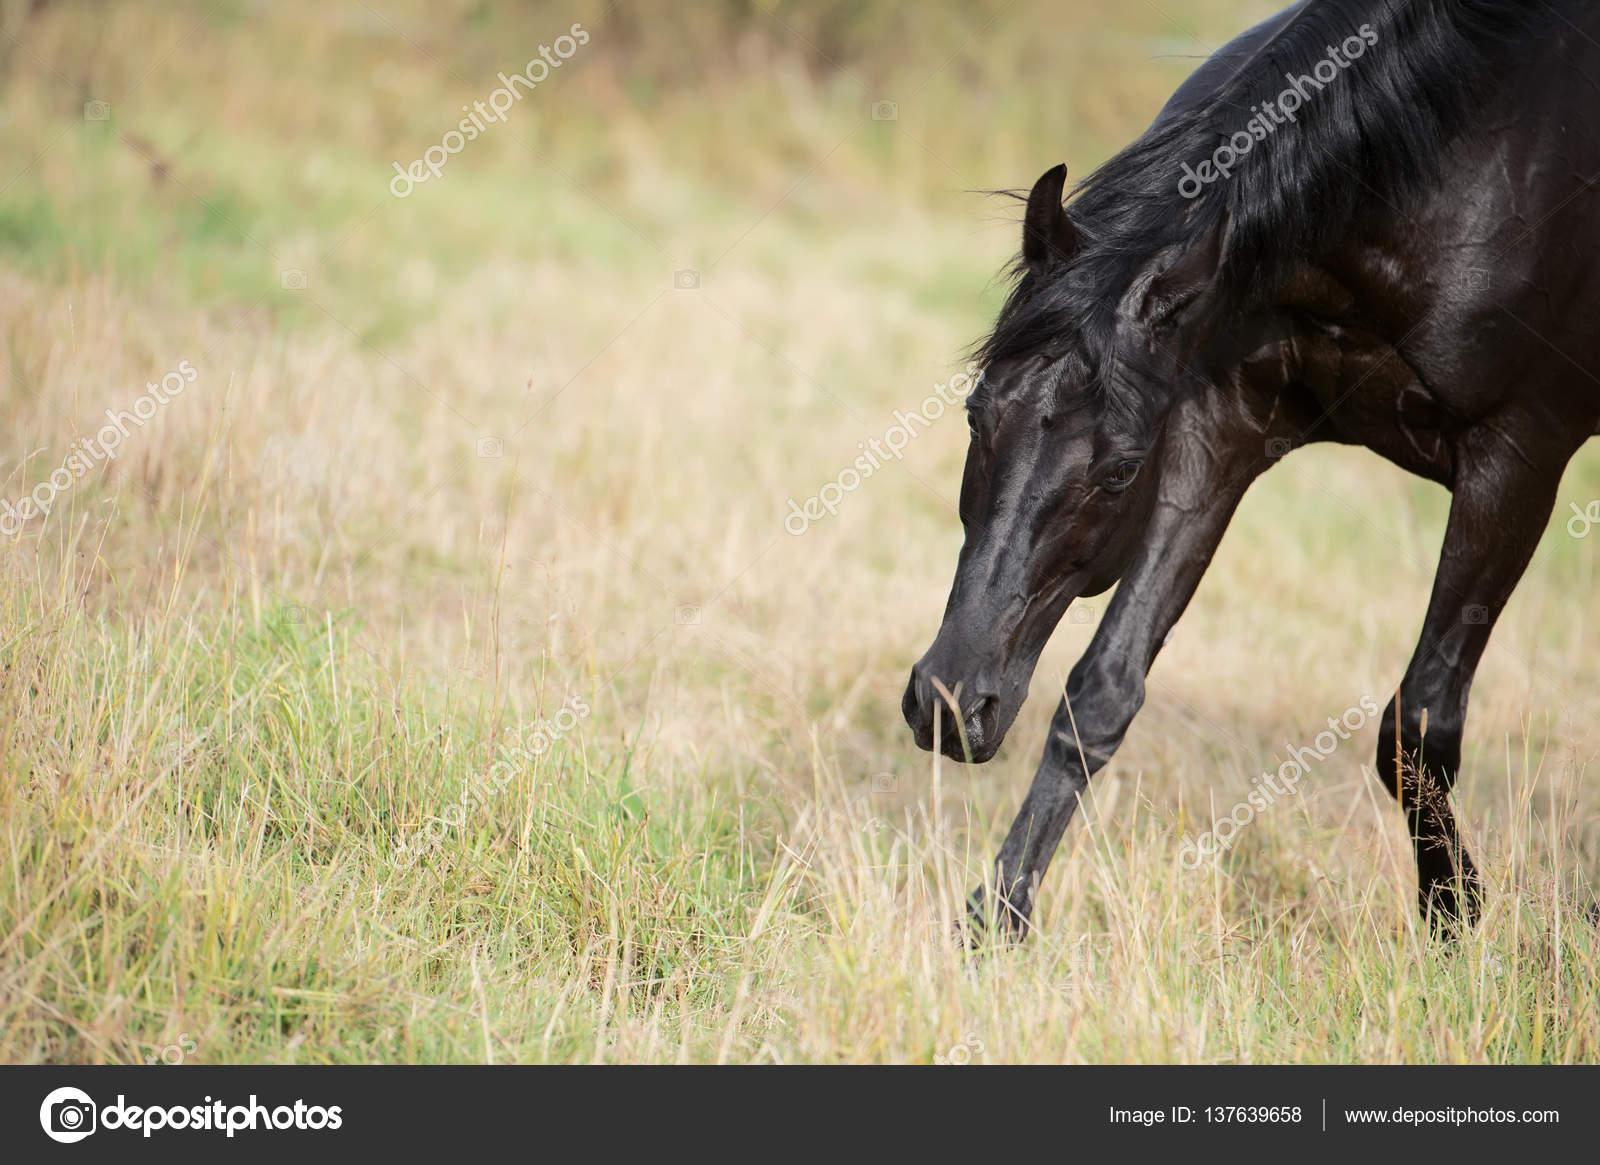 Portrait Of Running Black Horse In Field Stock Photo C Anakondasp 137639658